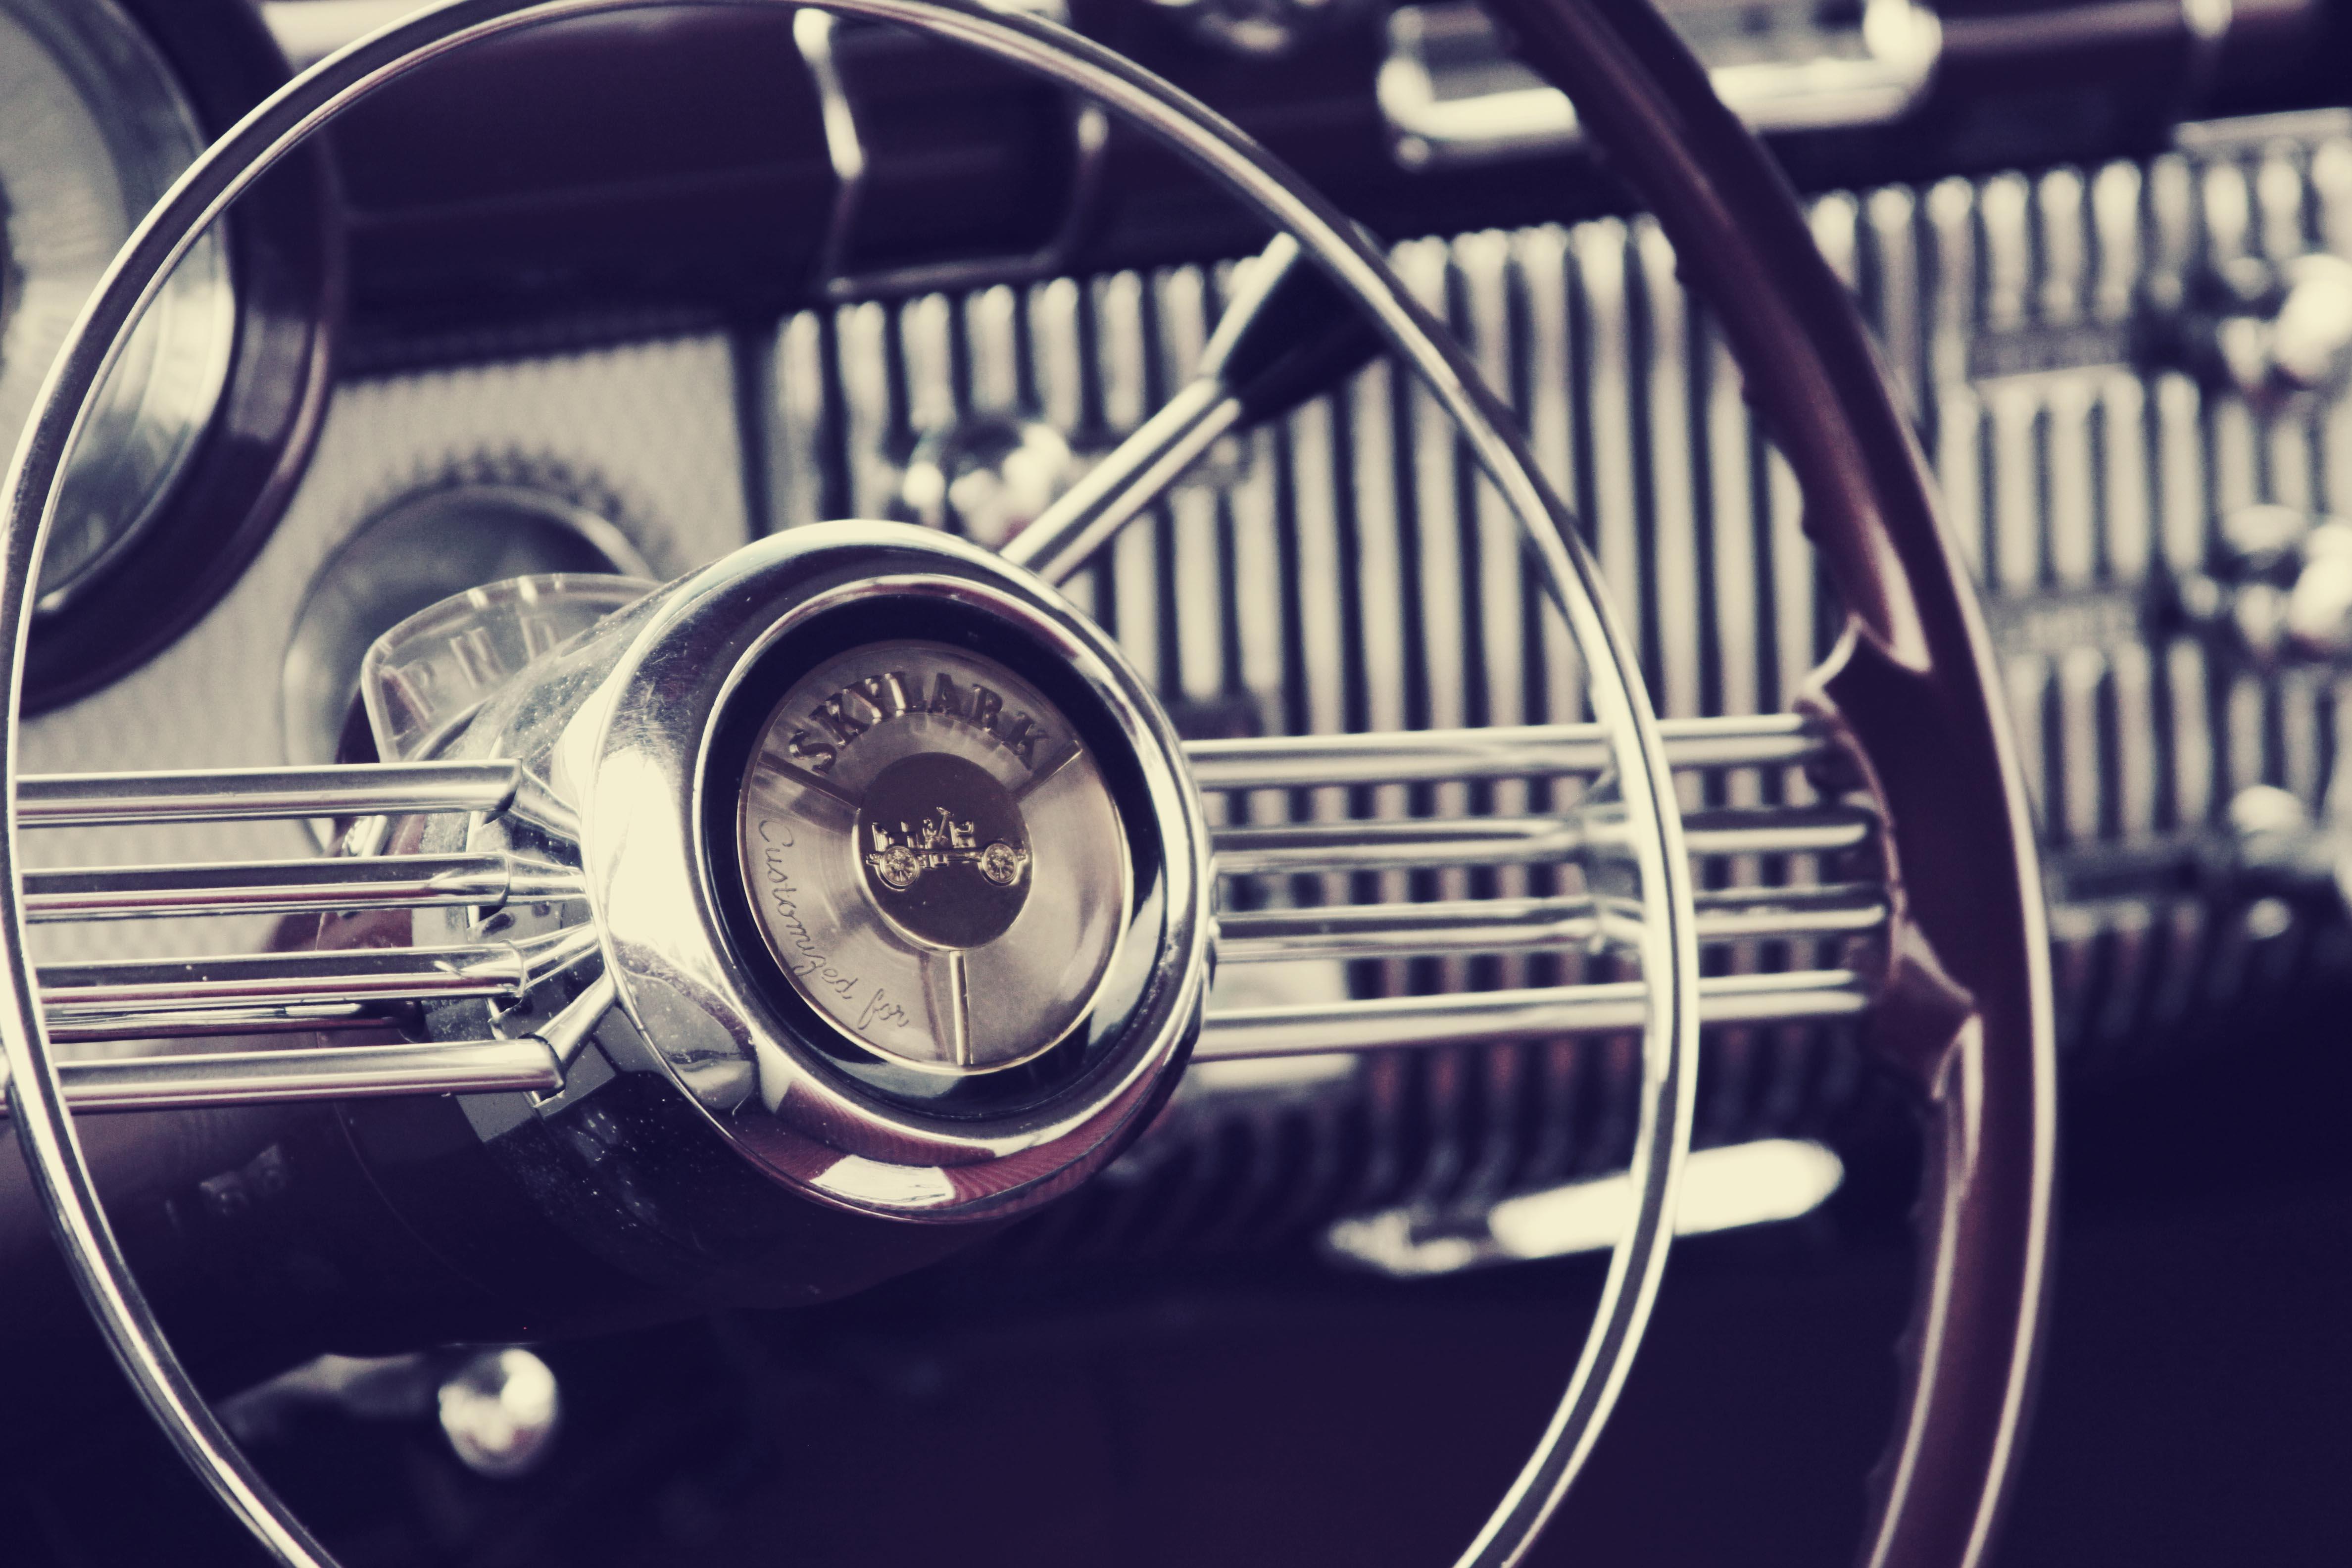 Wallpaper Old Photography Buick Vintage Vintage Car Steering